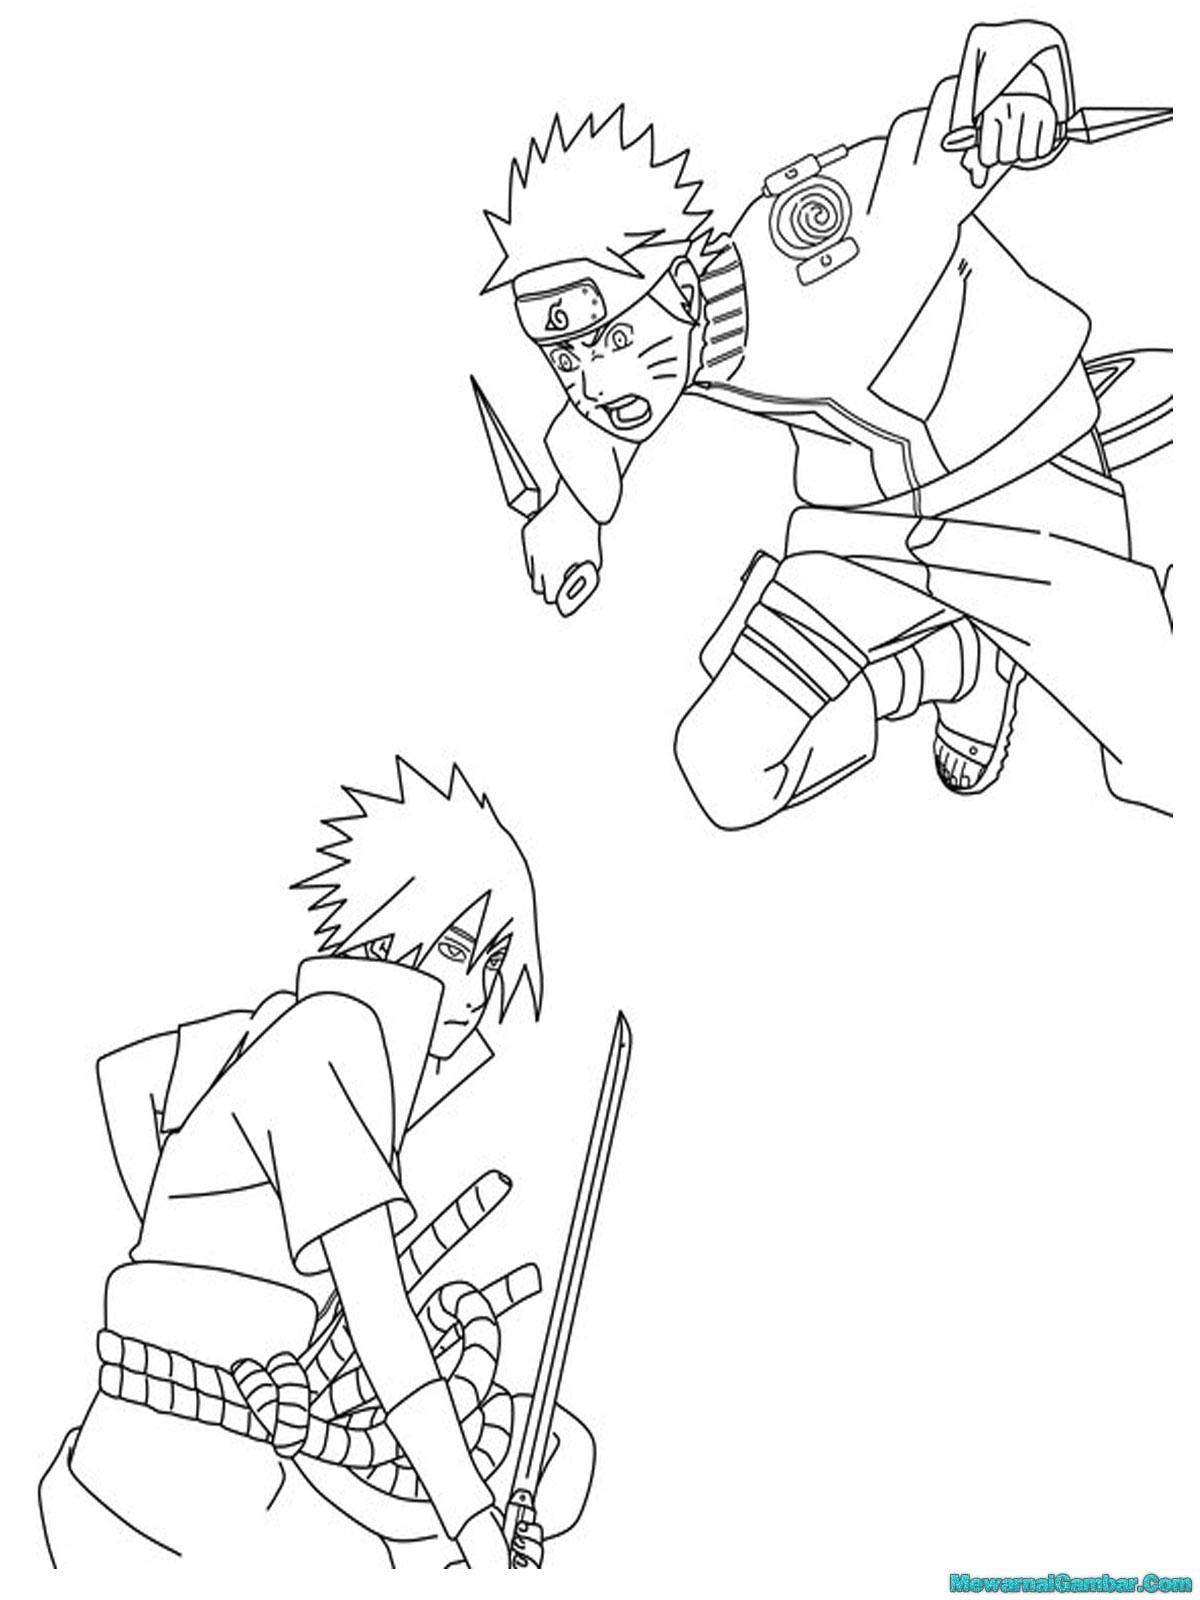 Mewarnai Gambar Naruto | Mewarnai Gambar